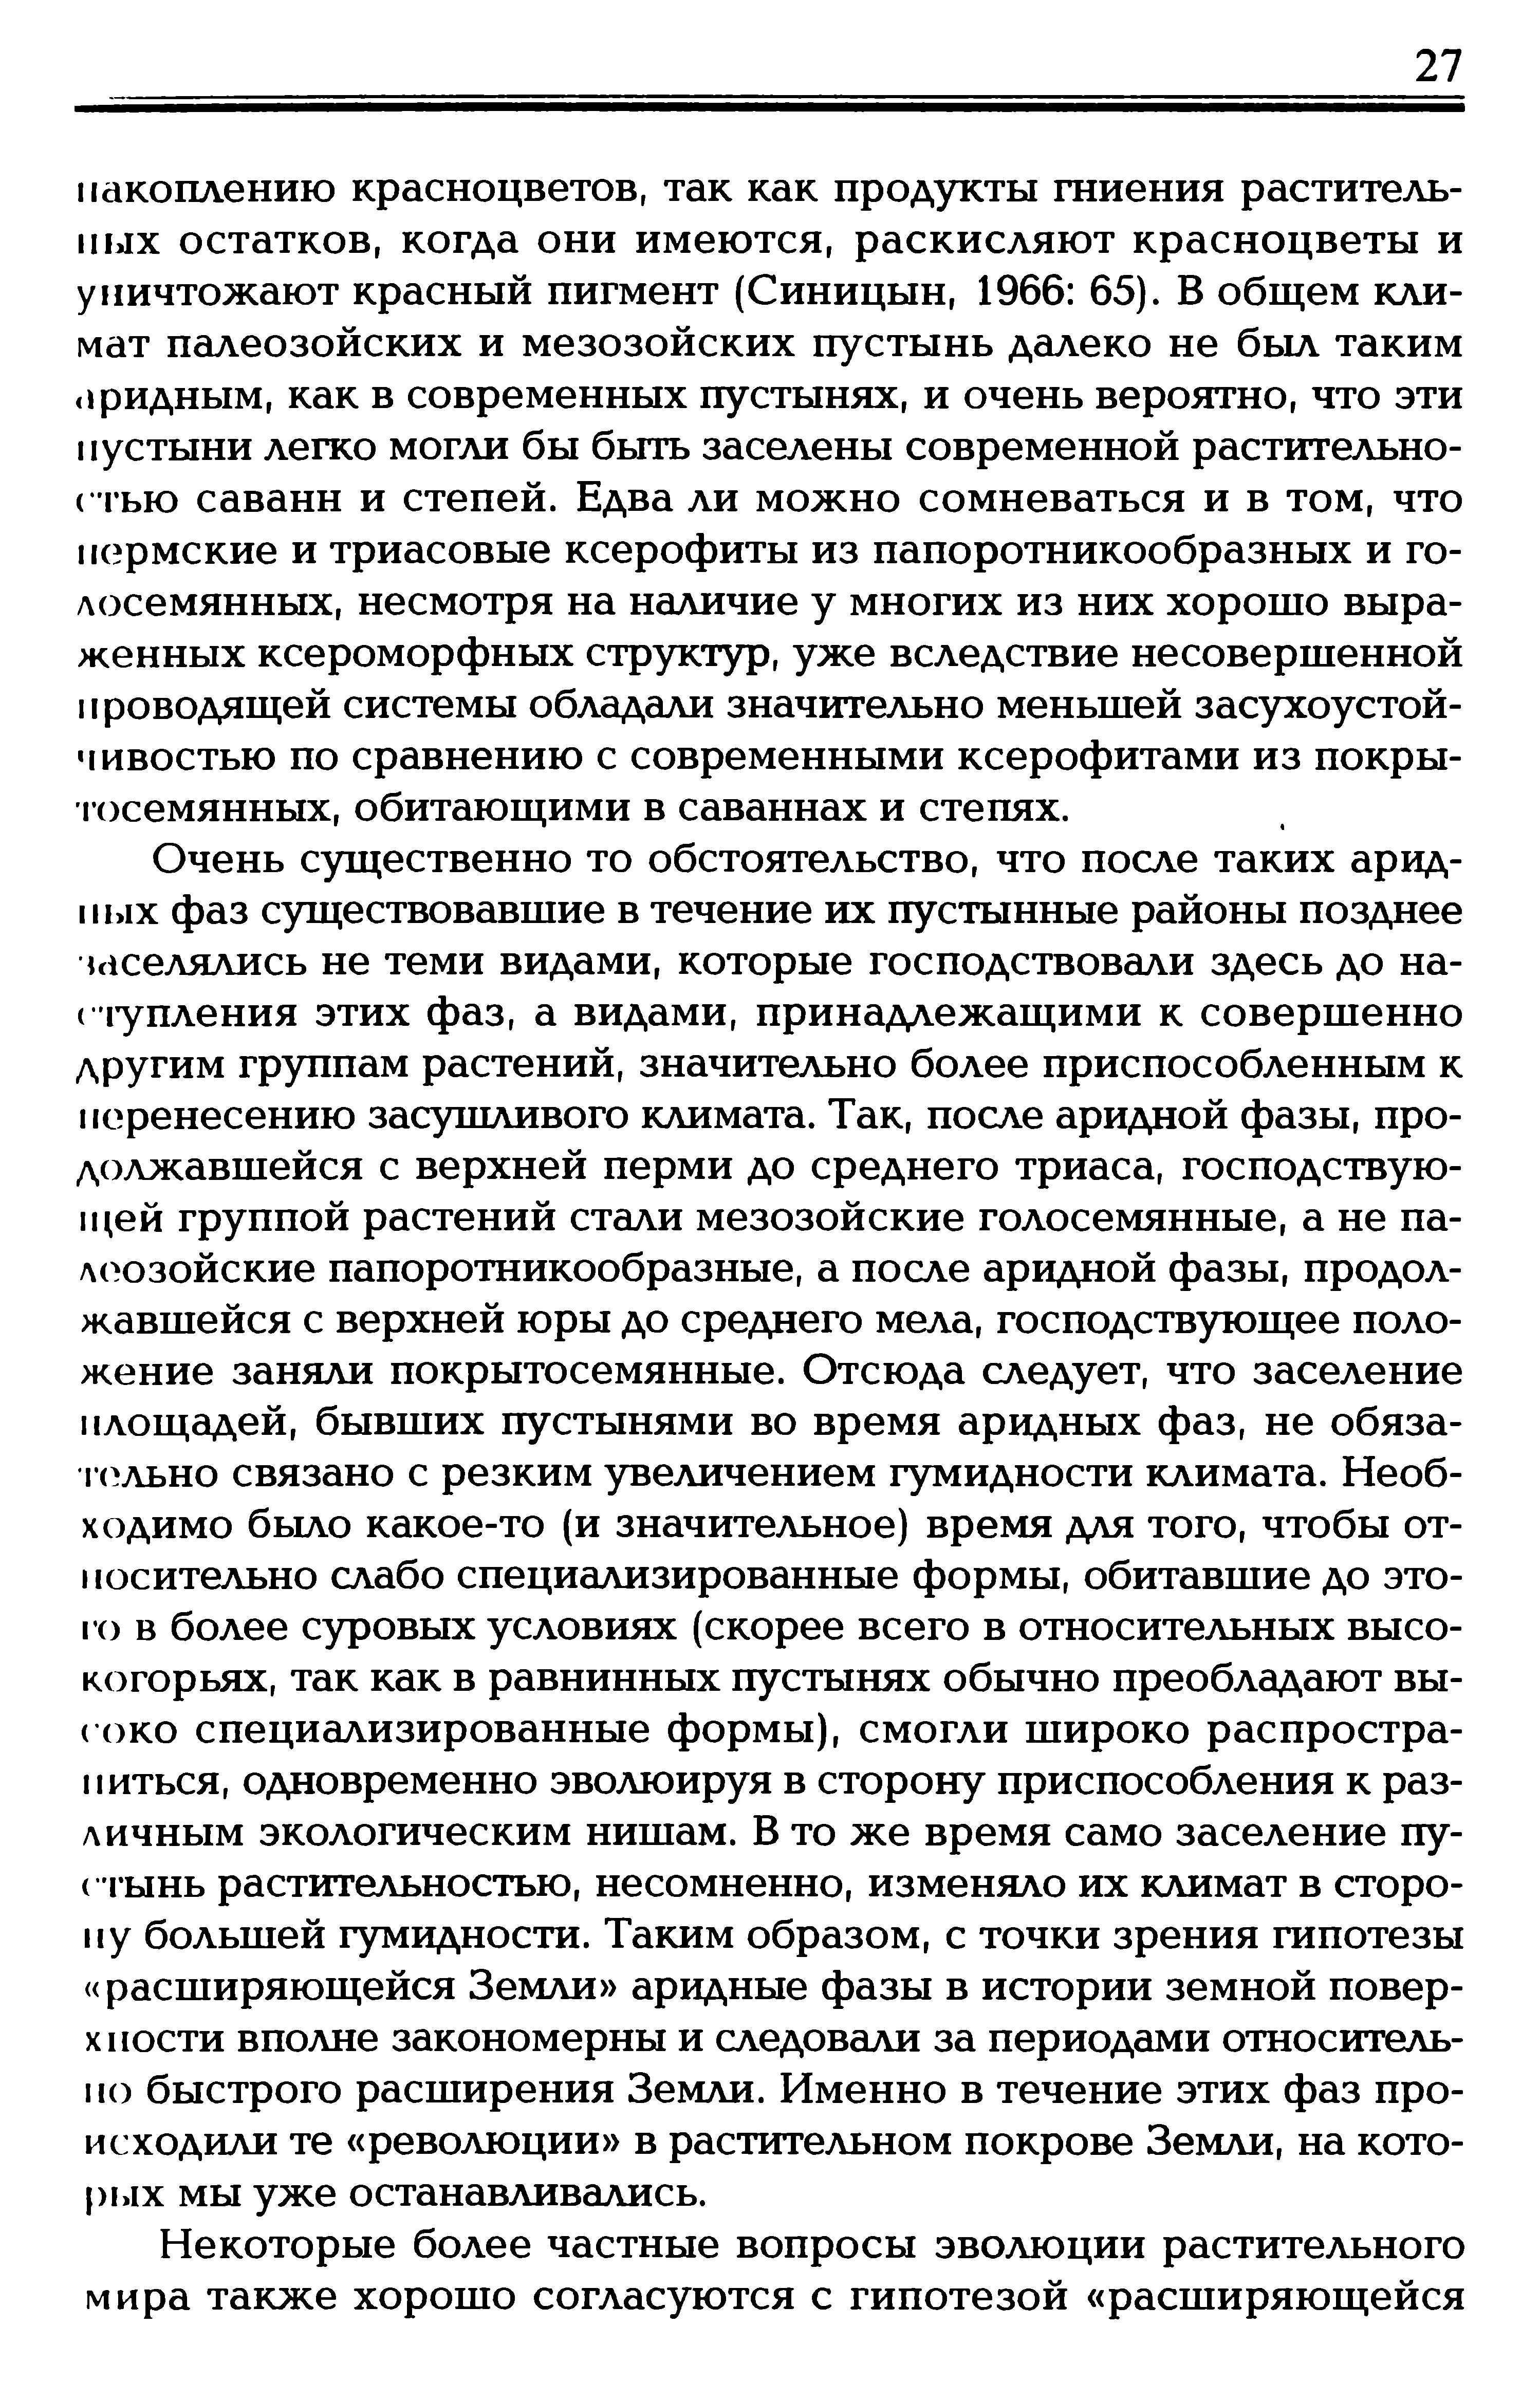 Tzvelev, 2005_1_08.jpeg